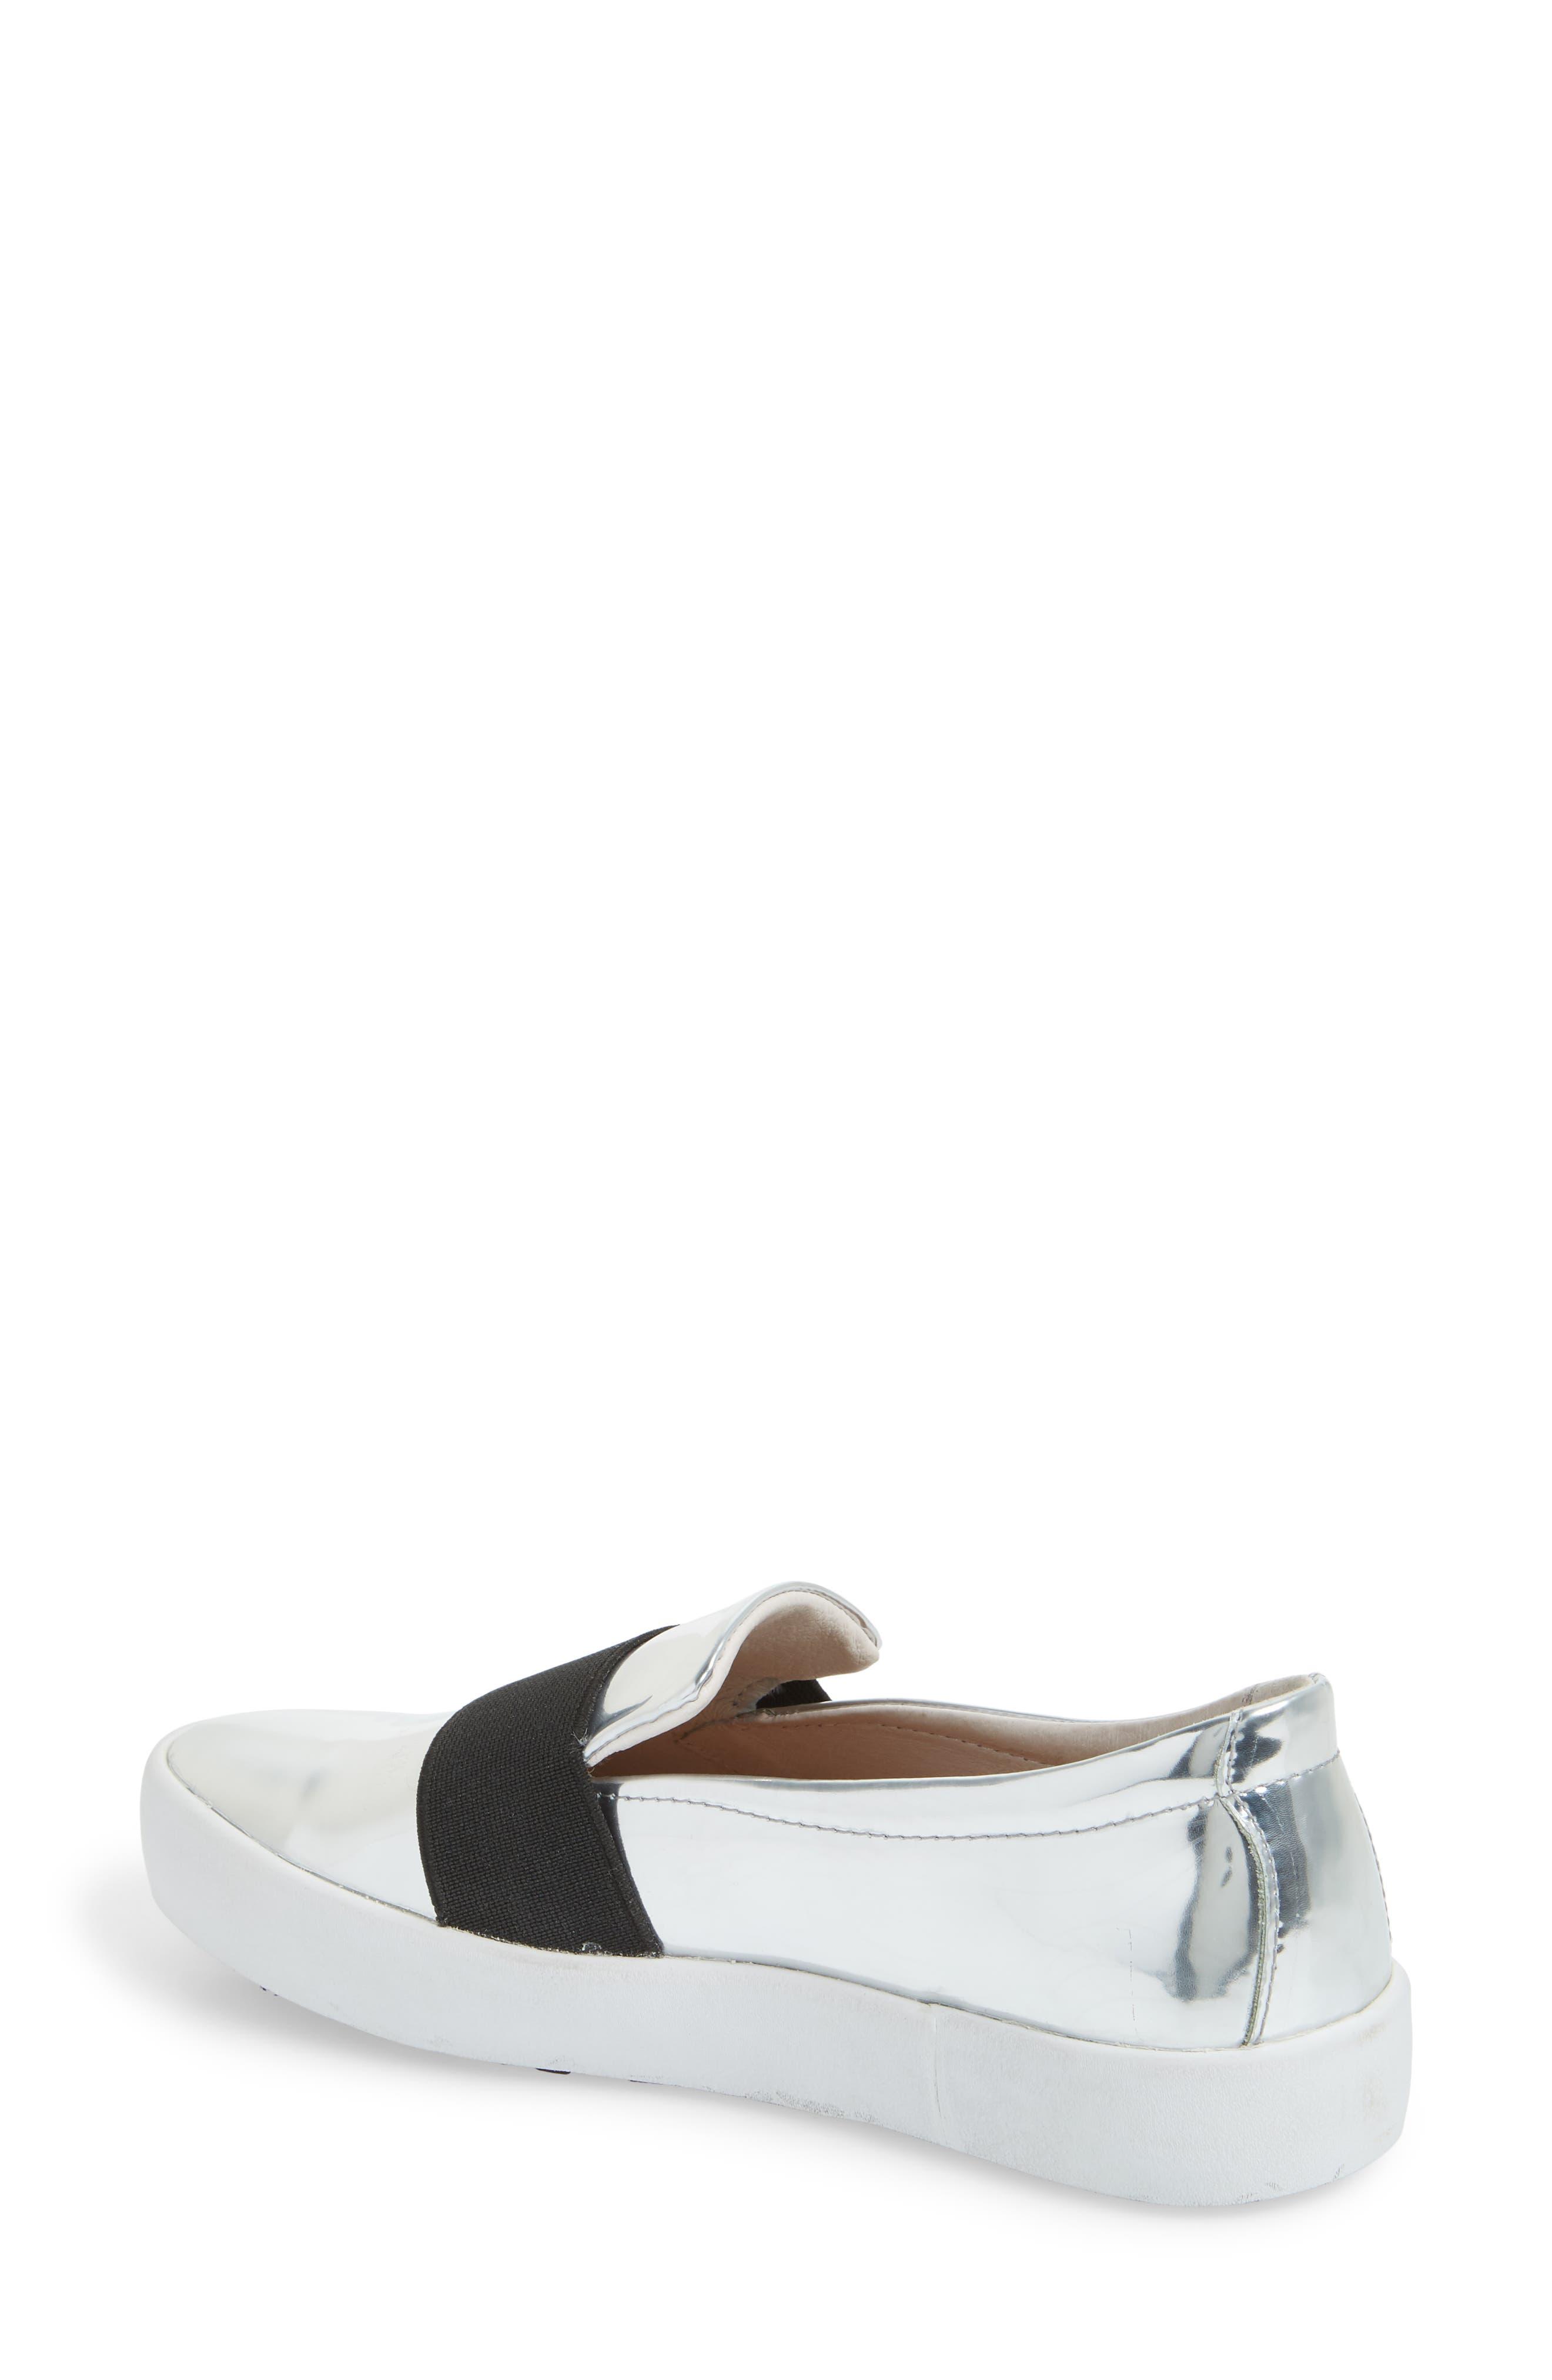 PL99 Slip-On Sneaker,                             Alternate thumbnail 2, color,                             Silver Leather